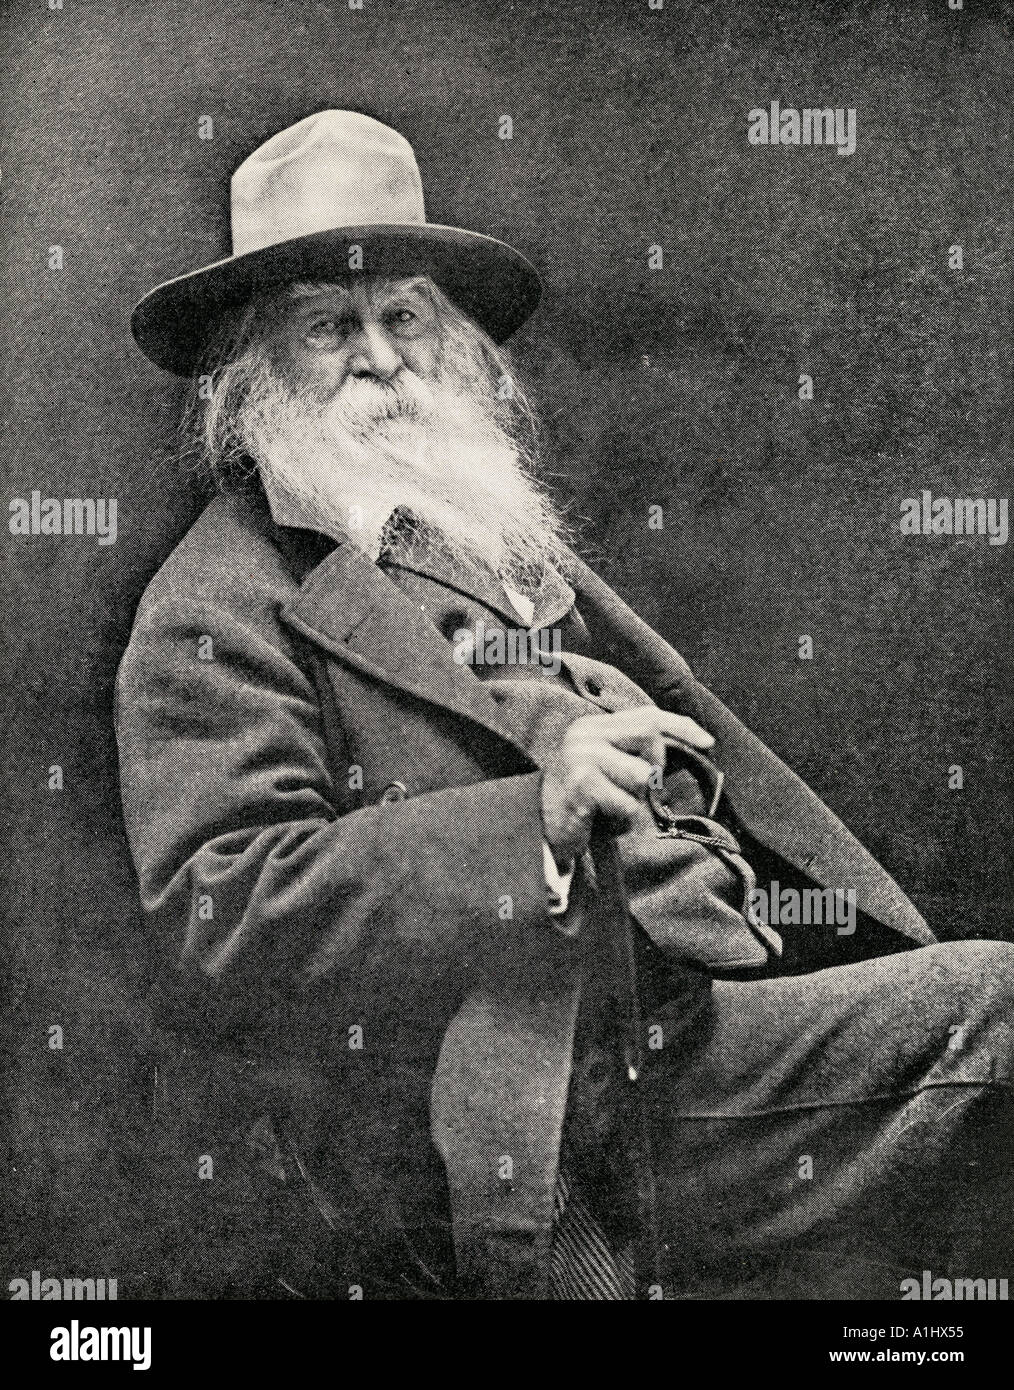 Walt Whitman, 1819 - 1892. Poeta americano Imagen De Stock